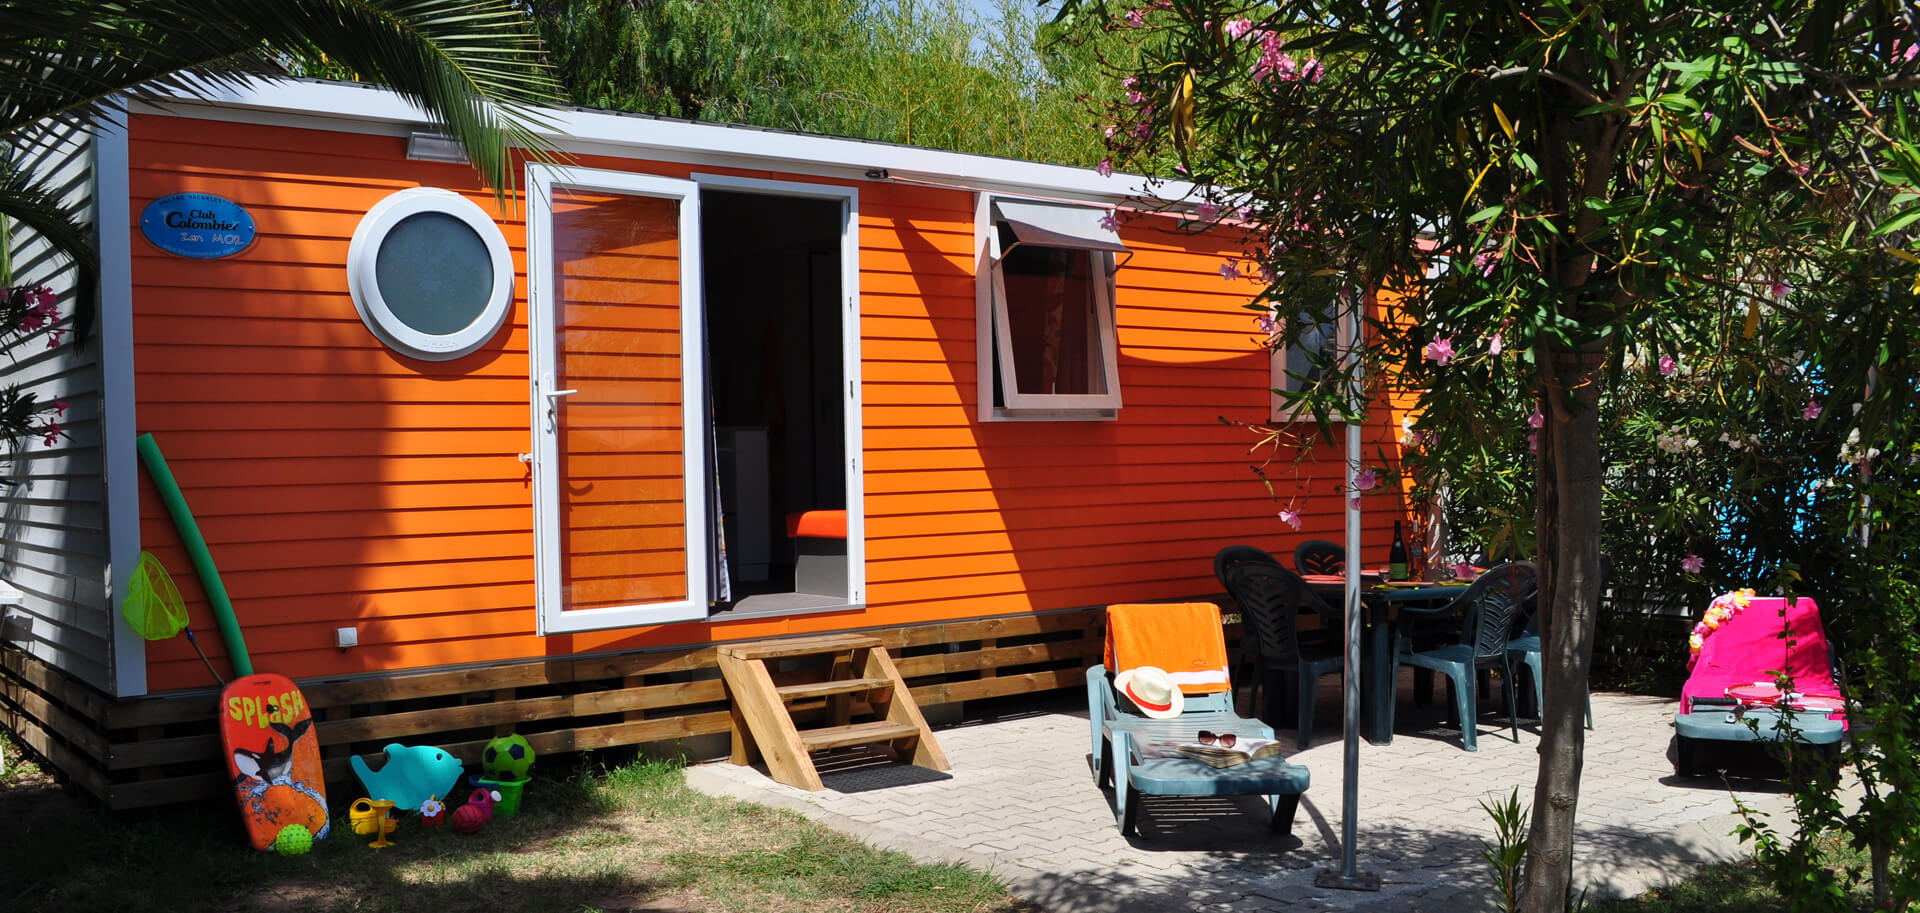 location de vacances mobile home zen 3 chambres. Black Bedroom Furniture Sets. Home Design Ideas